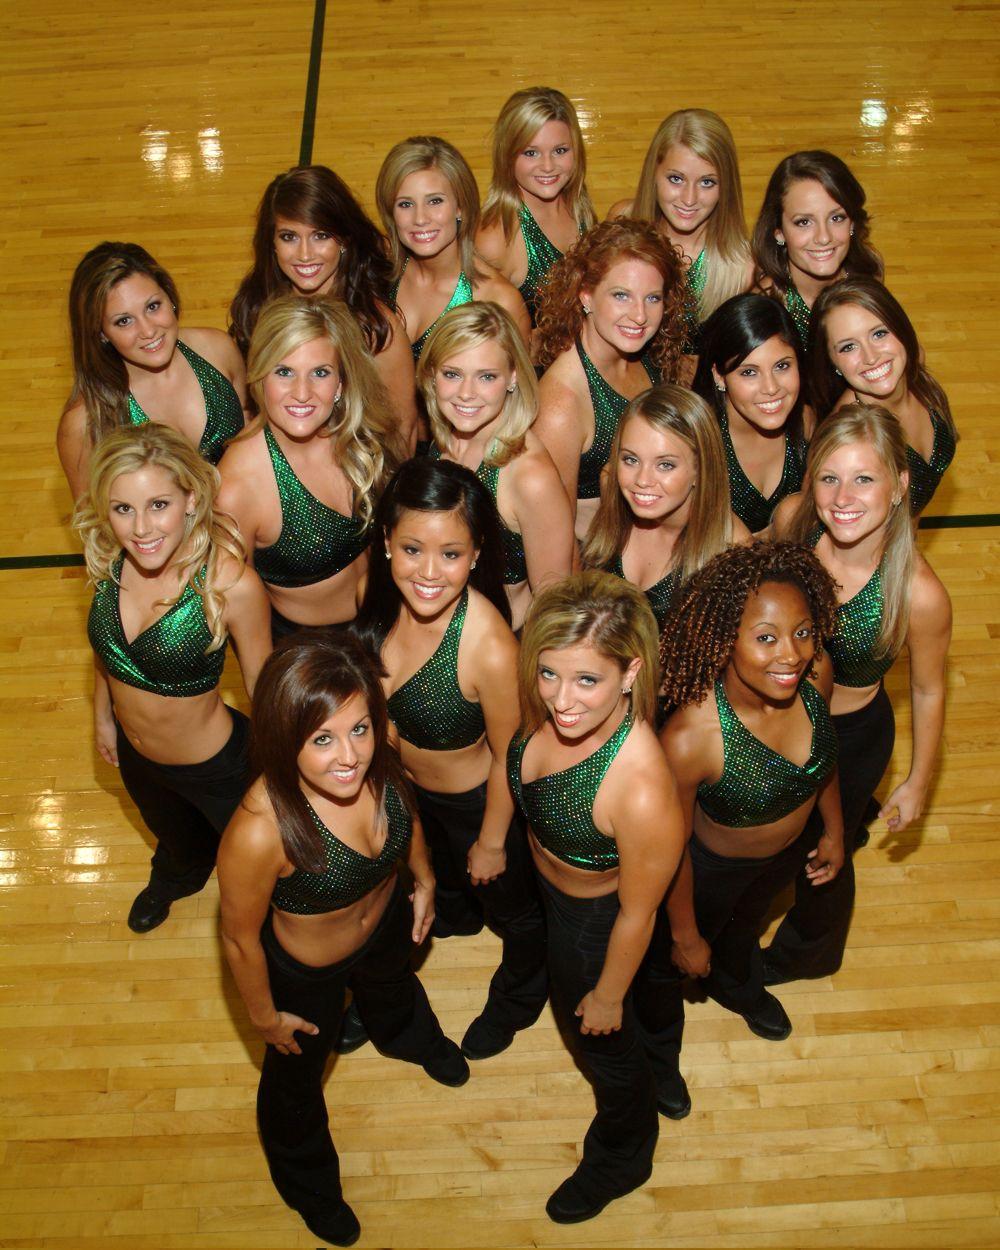 Michigan State University Dance Team Dance Team Photos Dance Teams Cheer Poses